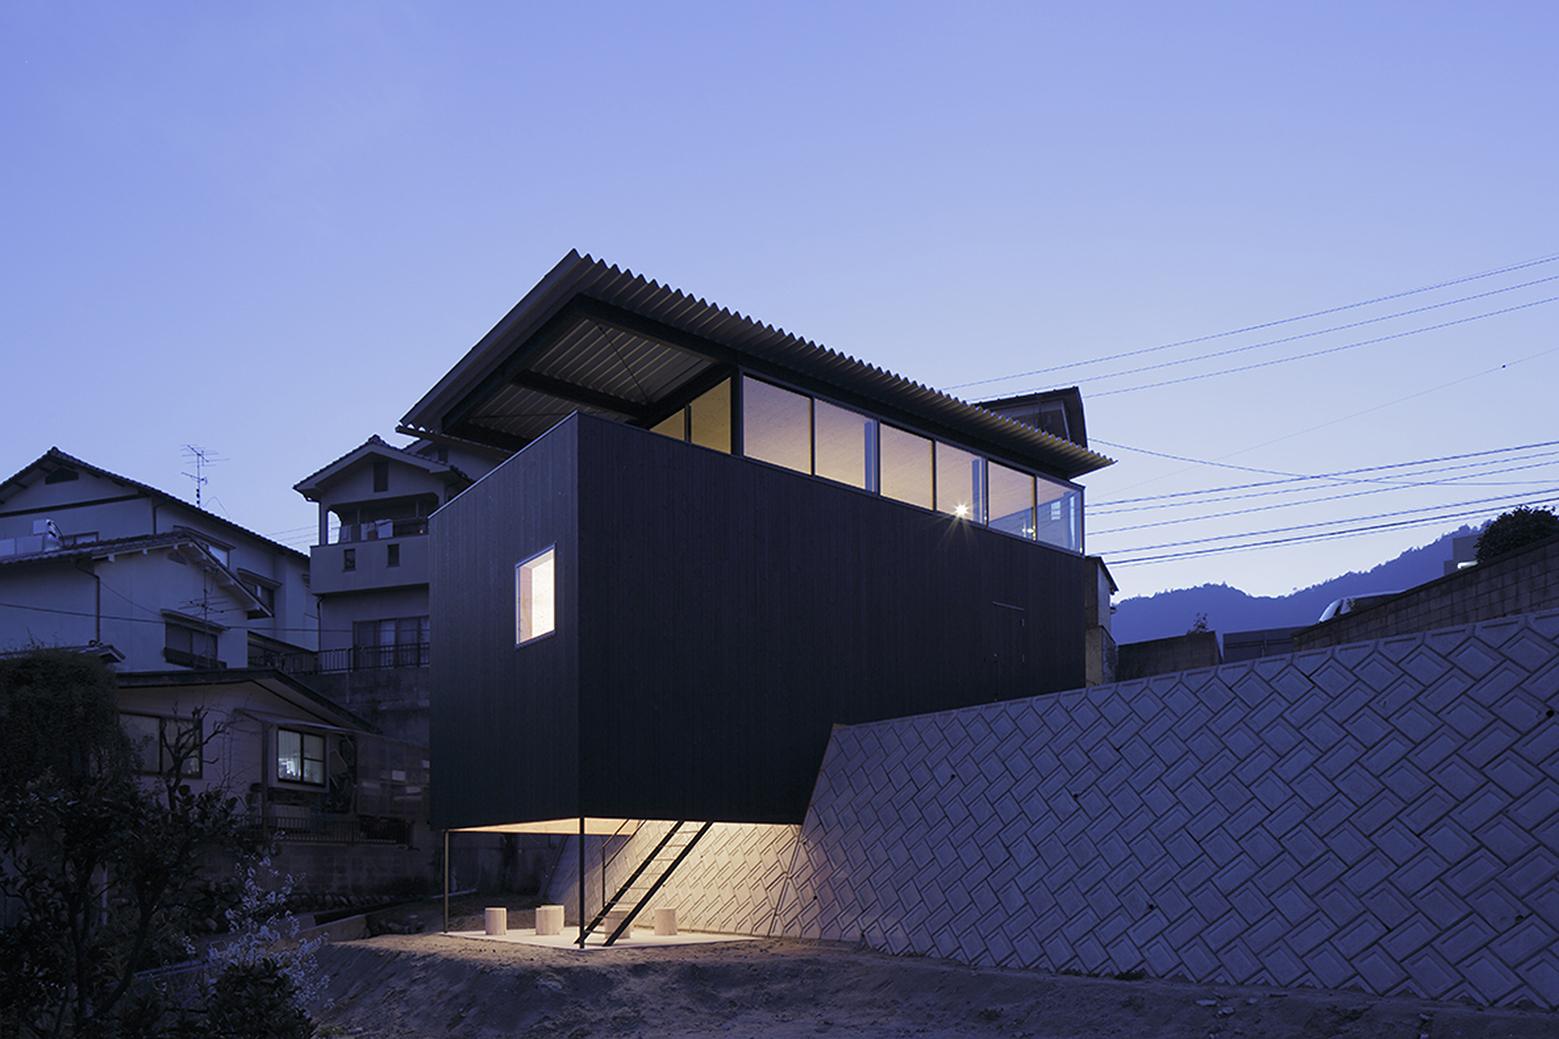 540ea129c07a80b90600014c_house-in-miyake-hidetaka-nakahara-architects-yoshio-ohno-architects_oono_miyake_140407_001